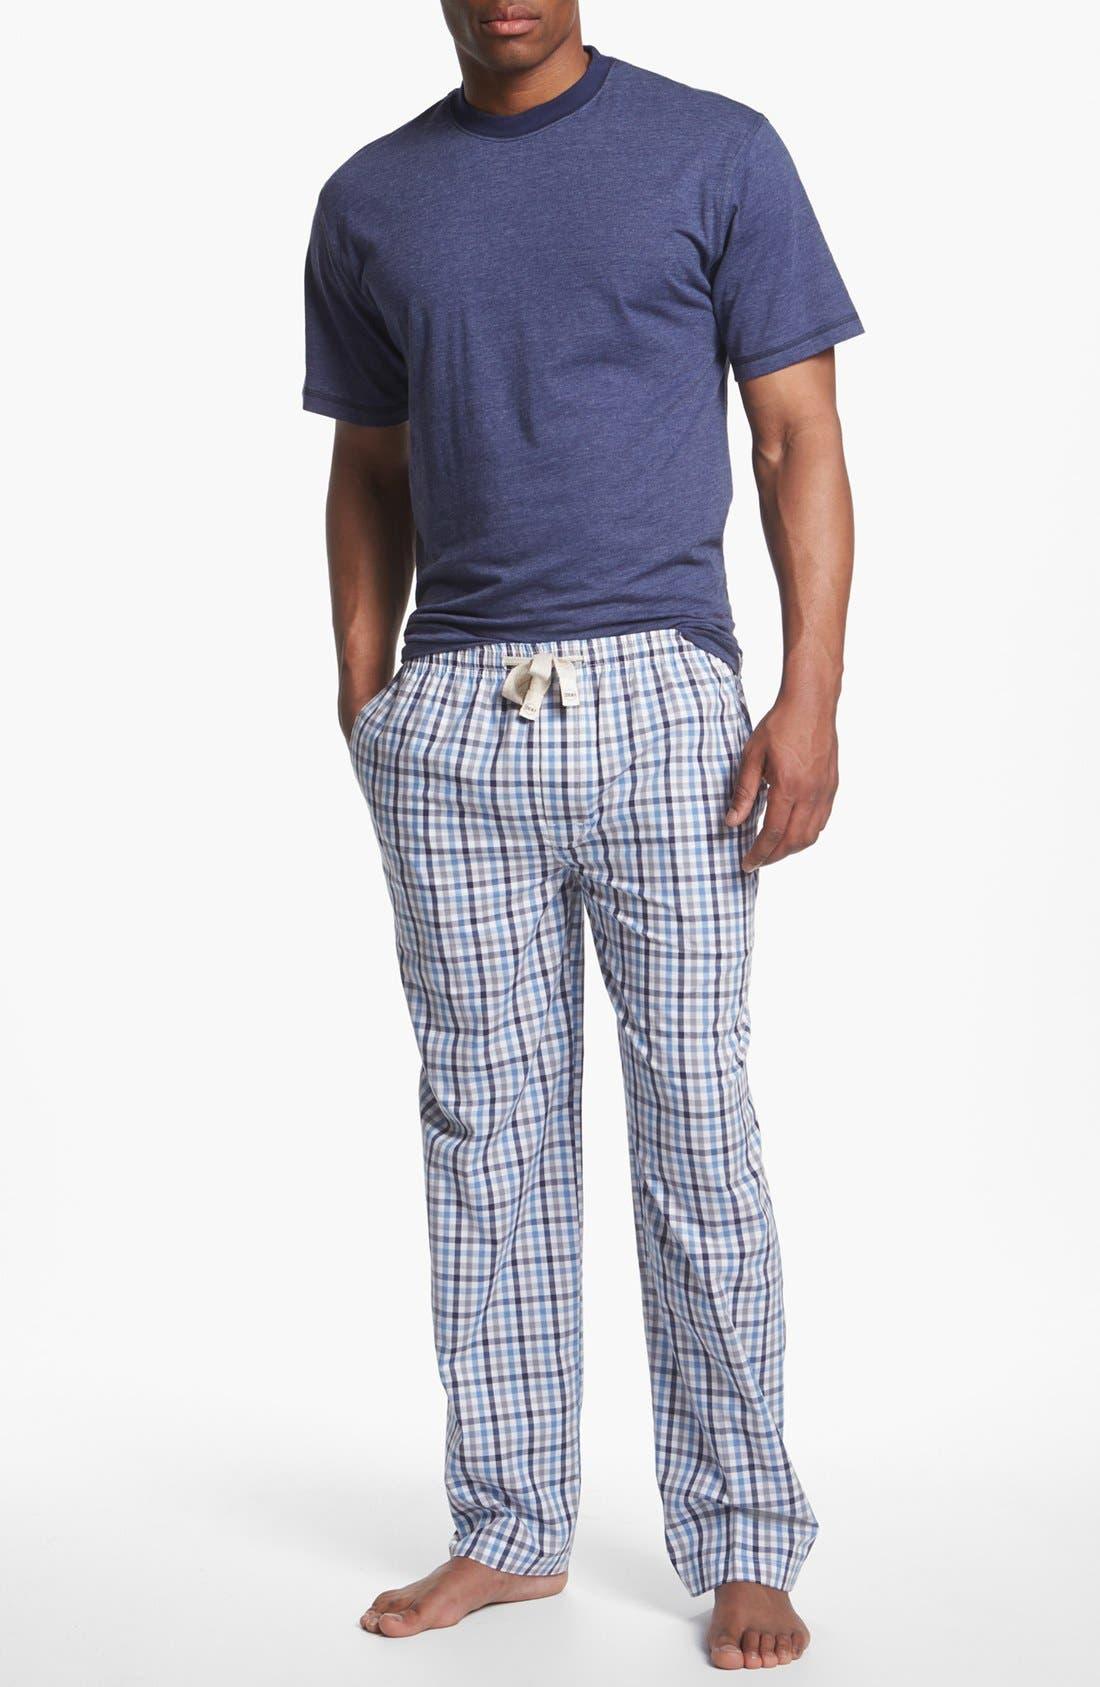 Alternate Image 1 Selected - Majestic International 'Vintage' Pajamas (Big)